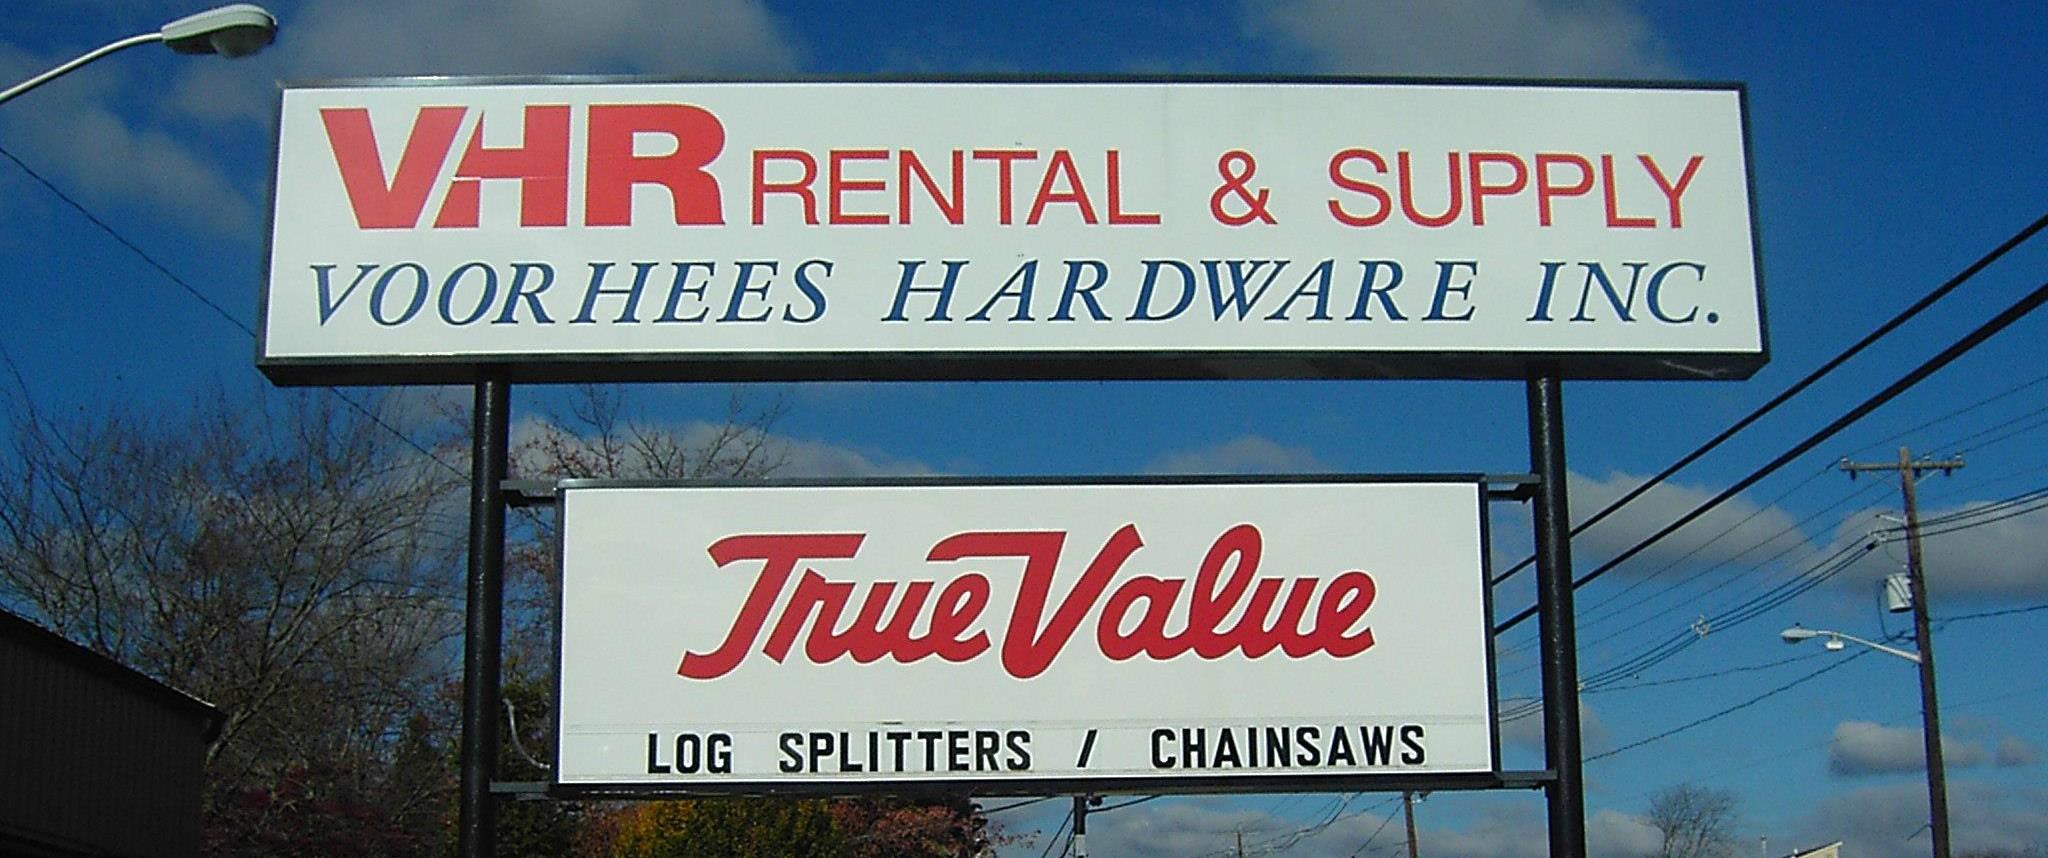 VHR Rental & Supply of New Jersey